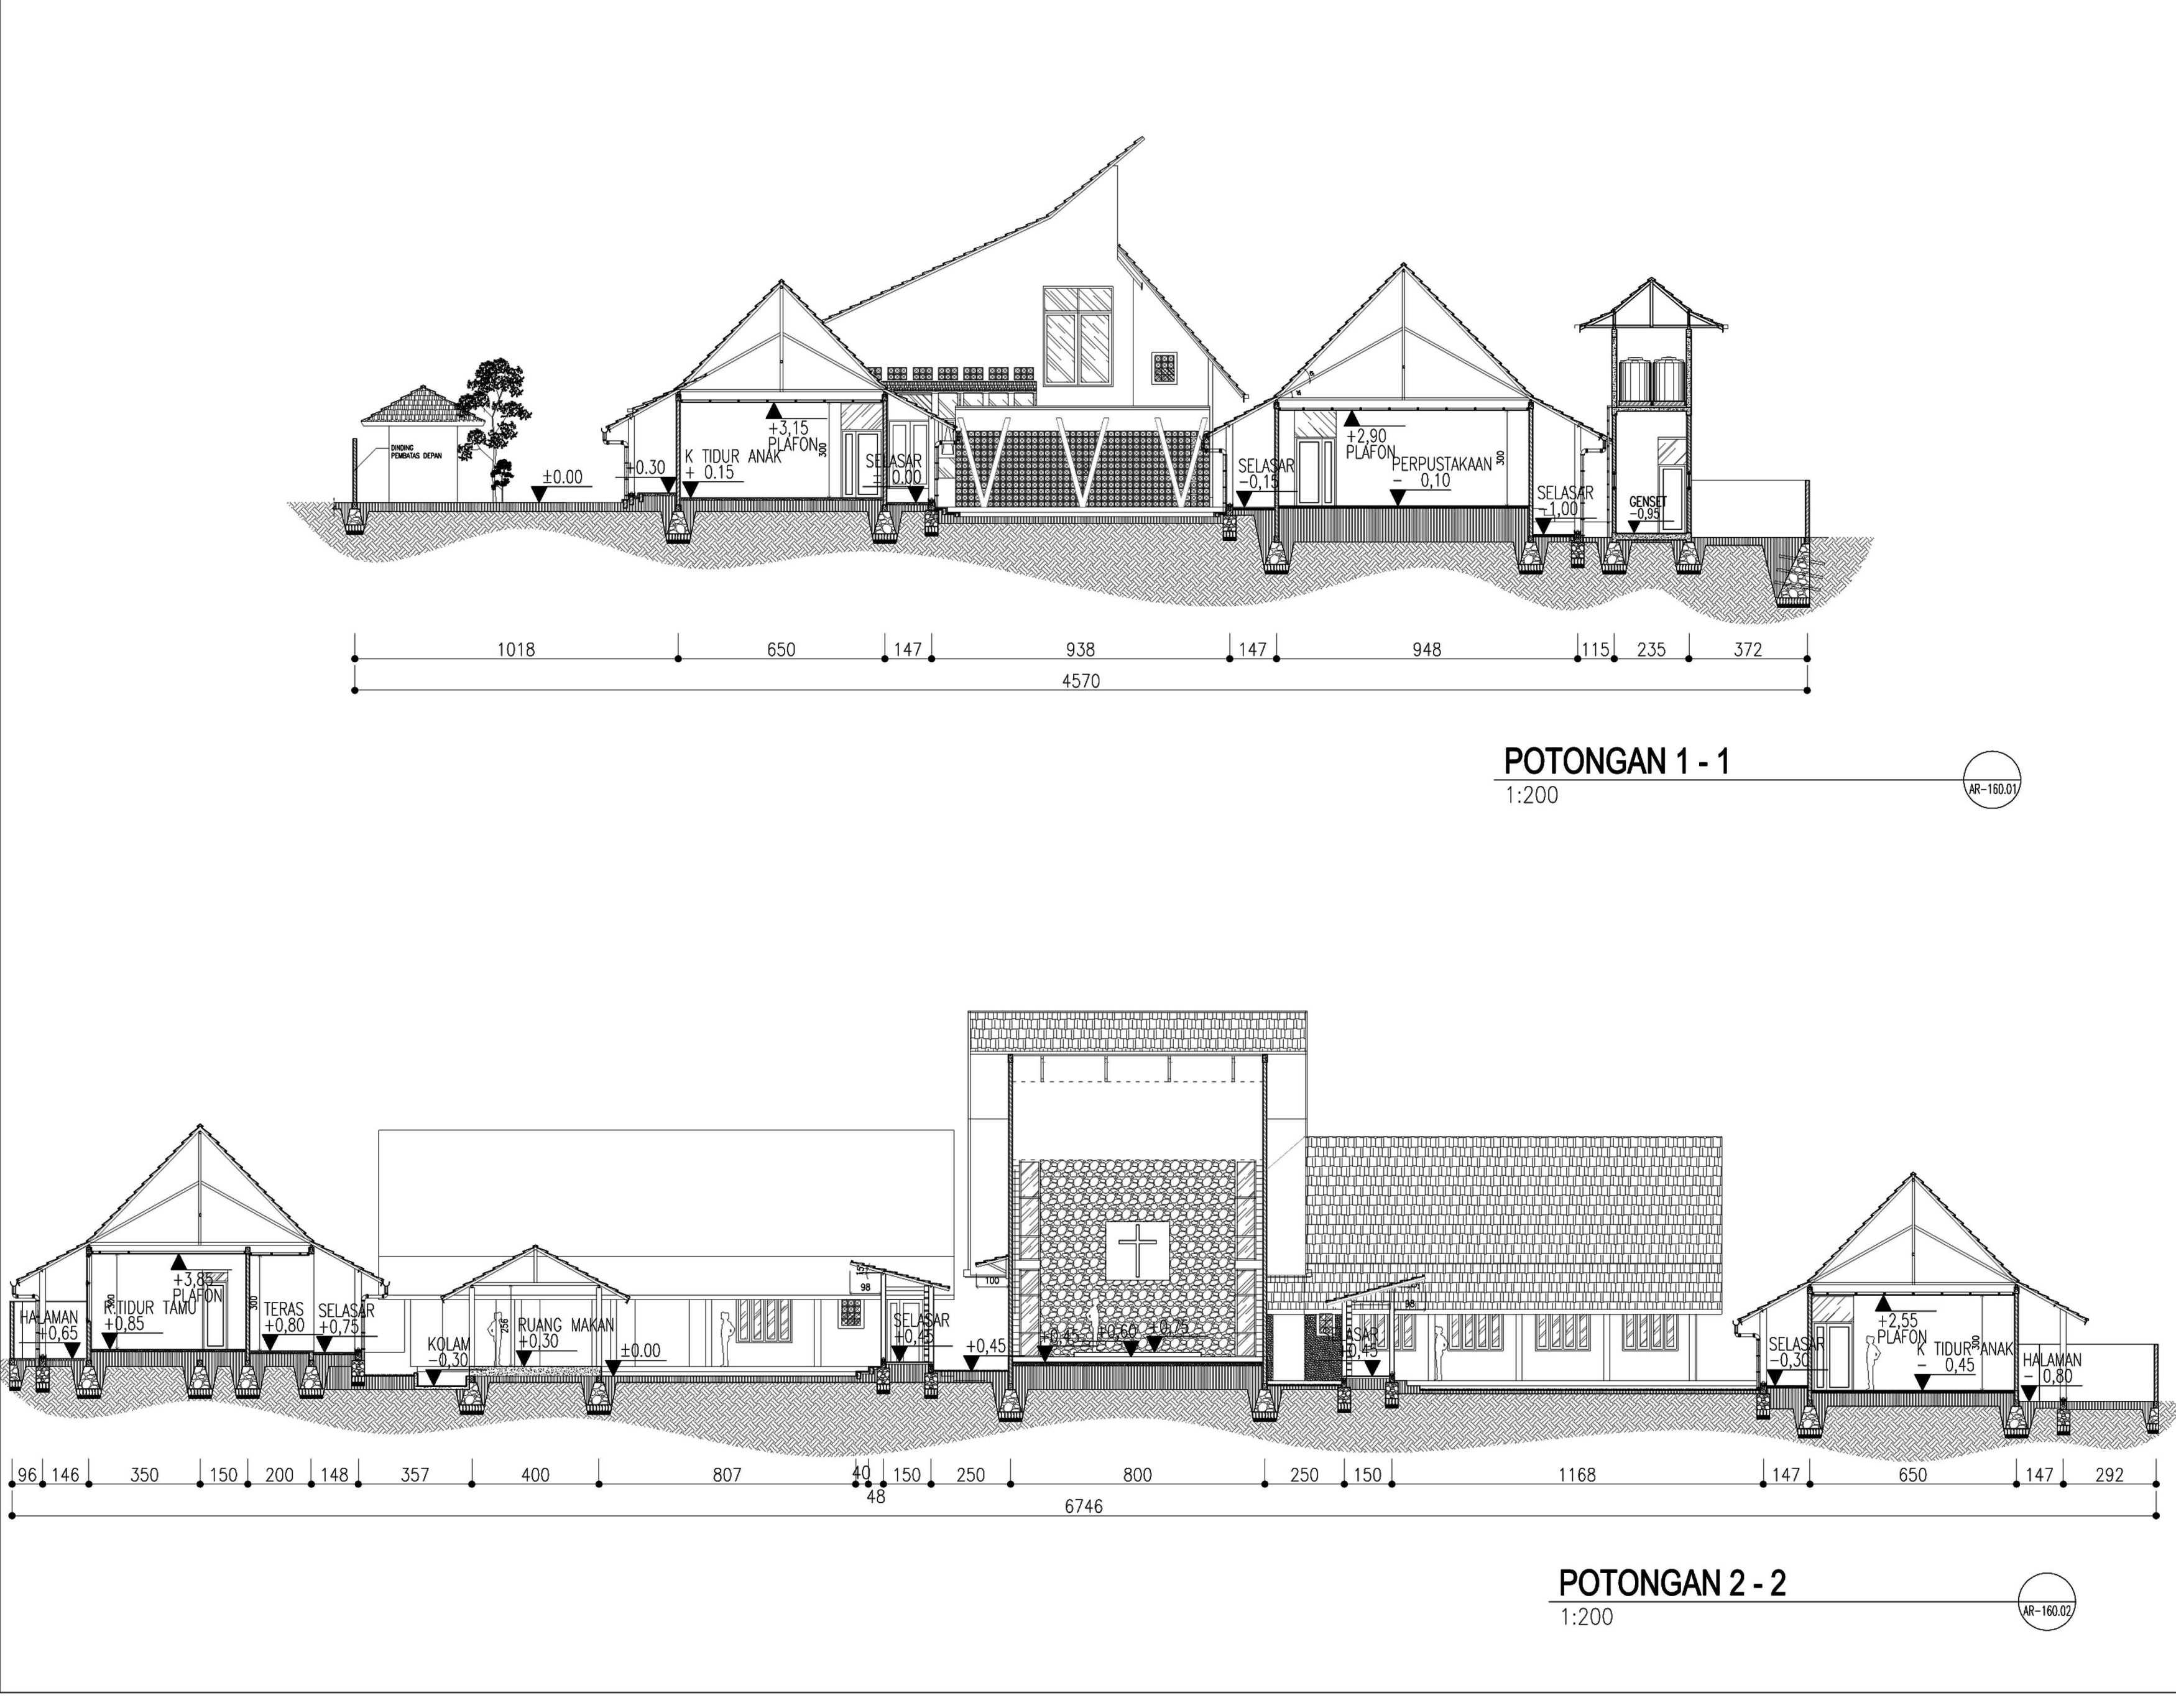 Gubah Ruang Studio Bk Putri Orphanages Pulau Nias, Sumatera Utara, Indonesia Pulau Nias, Sumatera Utara, Indonesia Concept   50667